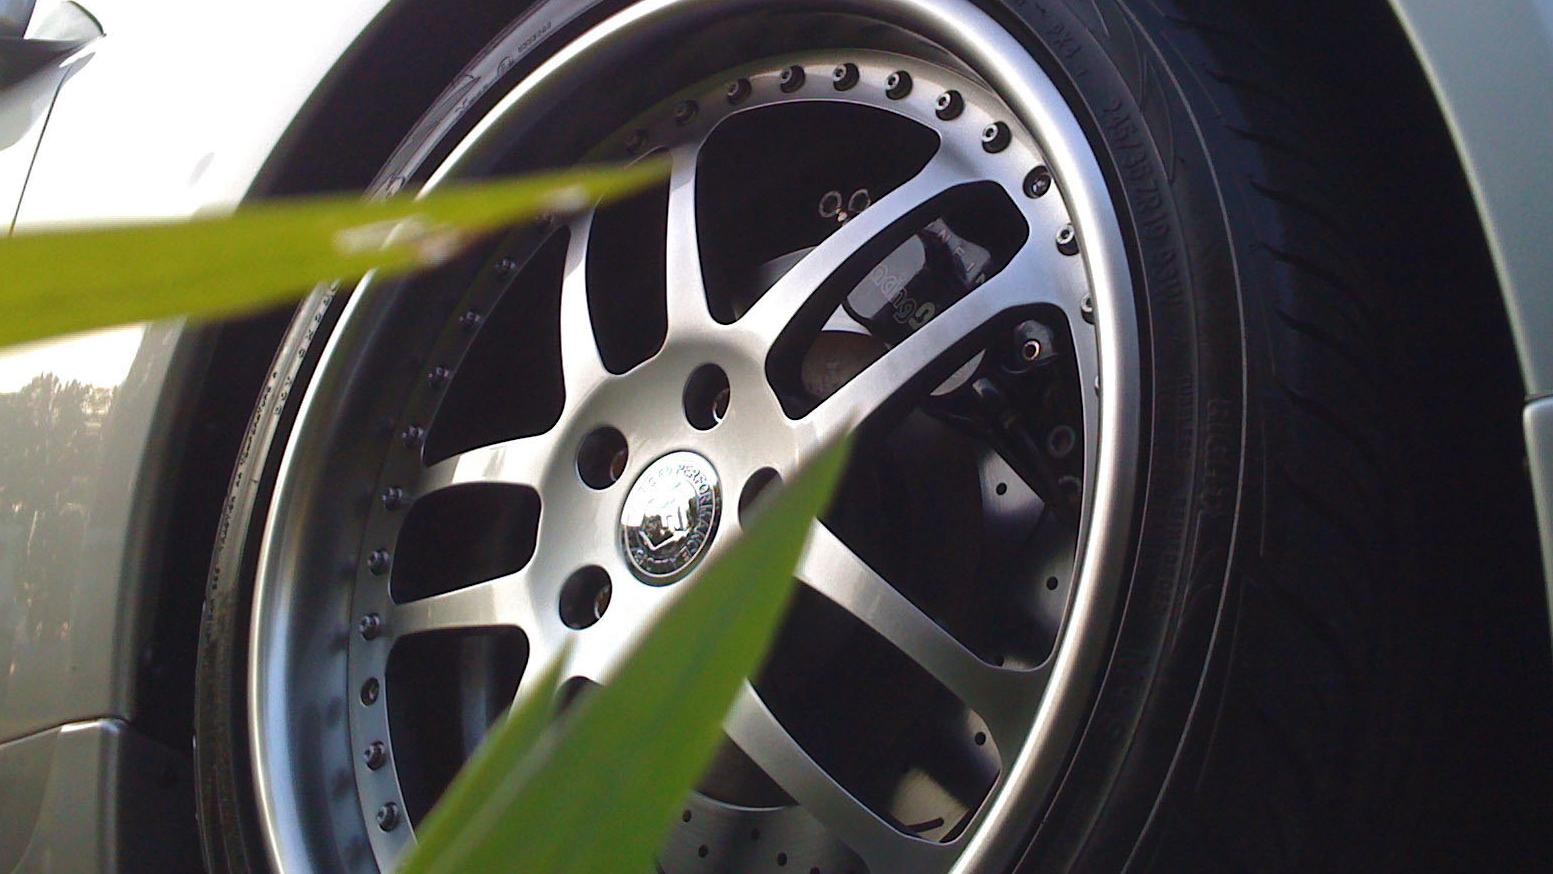 Wheels and brake 1.jpg